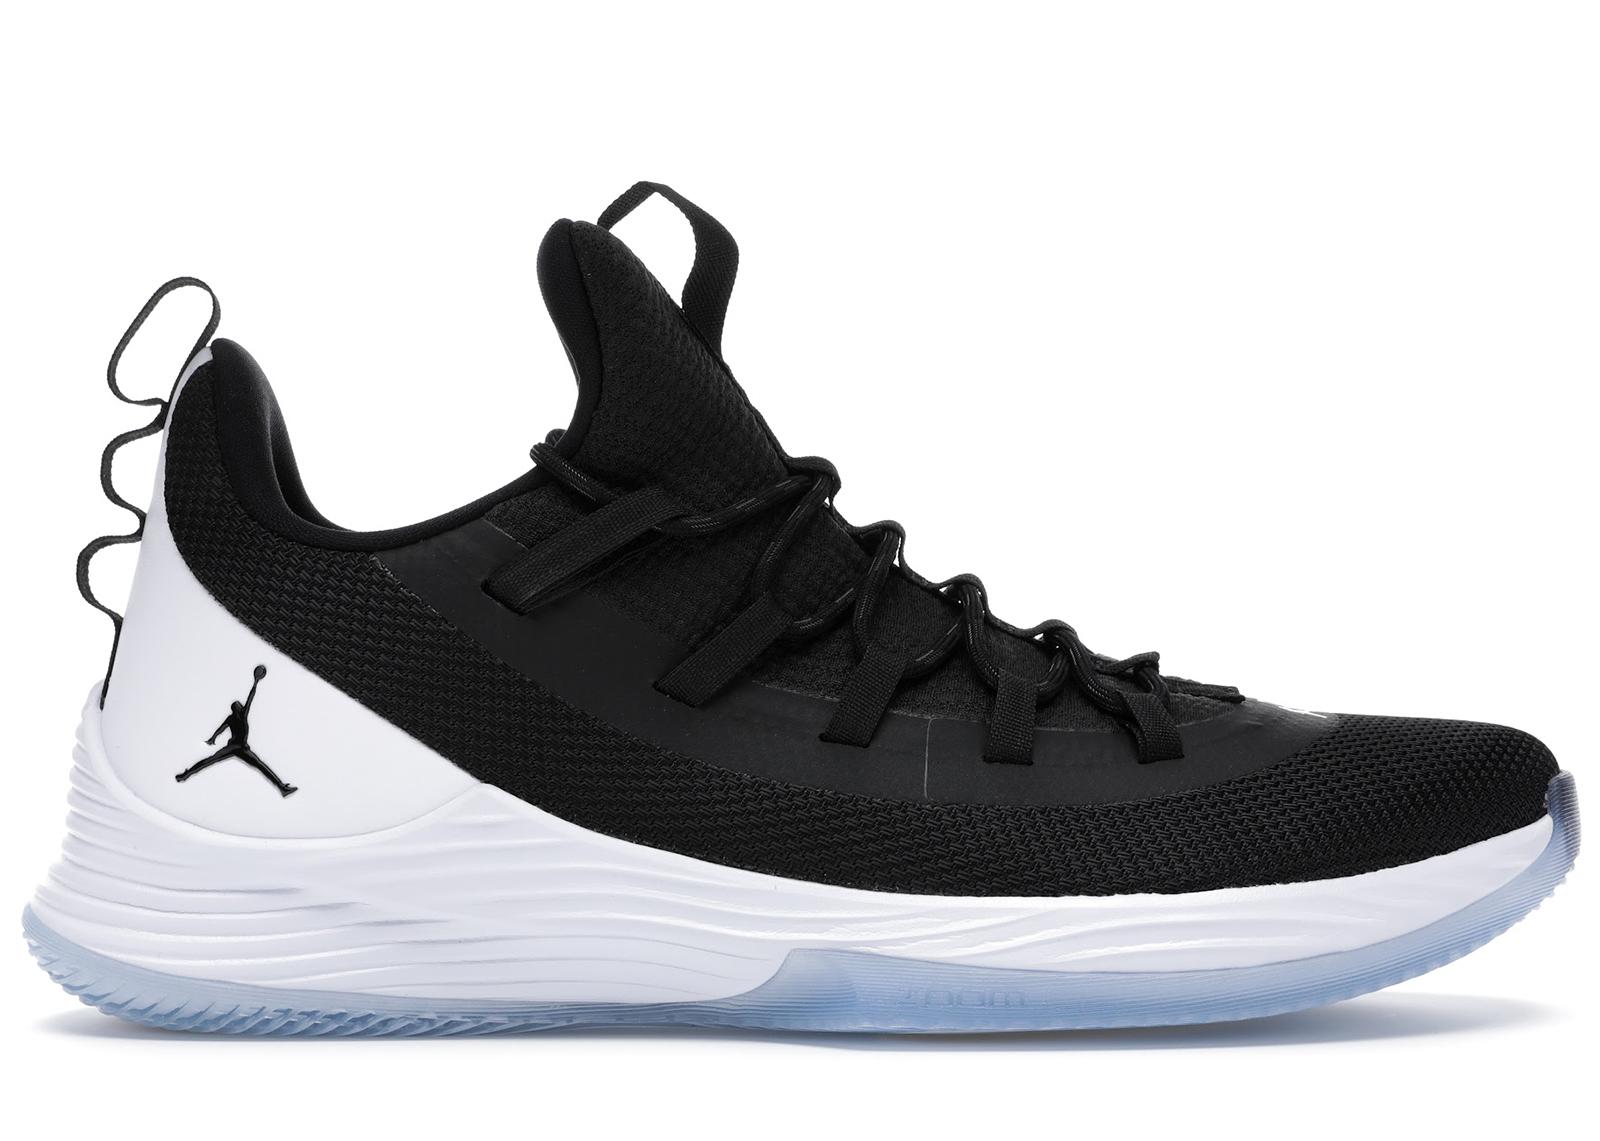 Jordan Ultra Fly 2 Low Black White